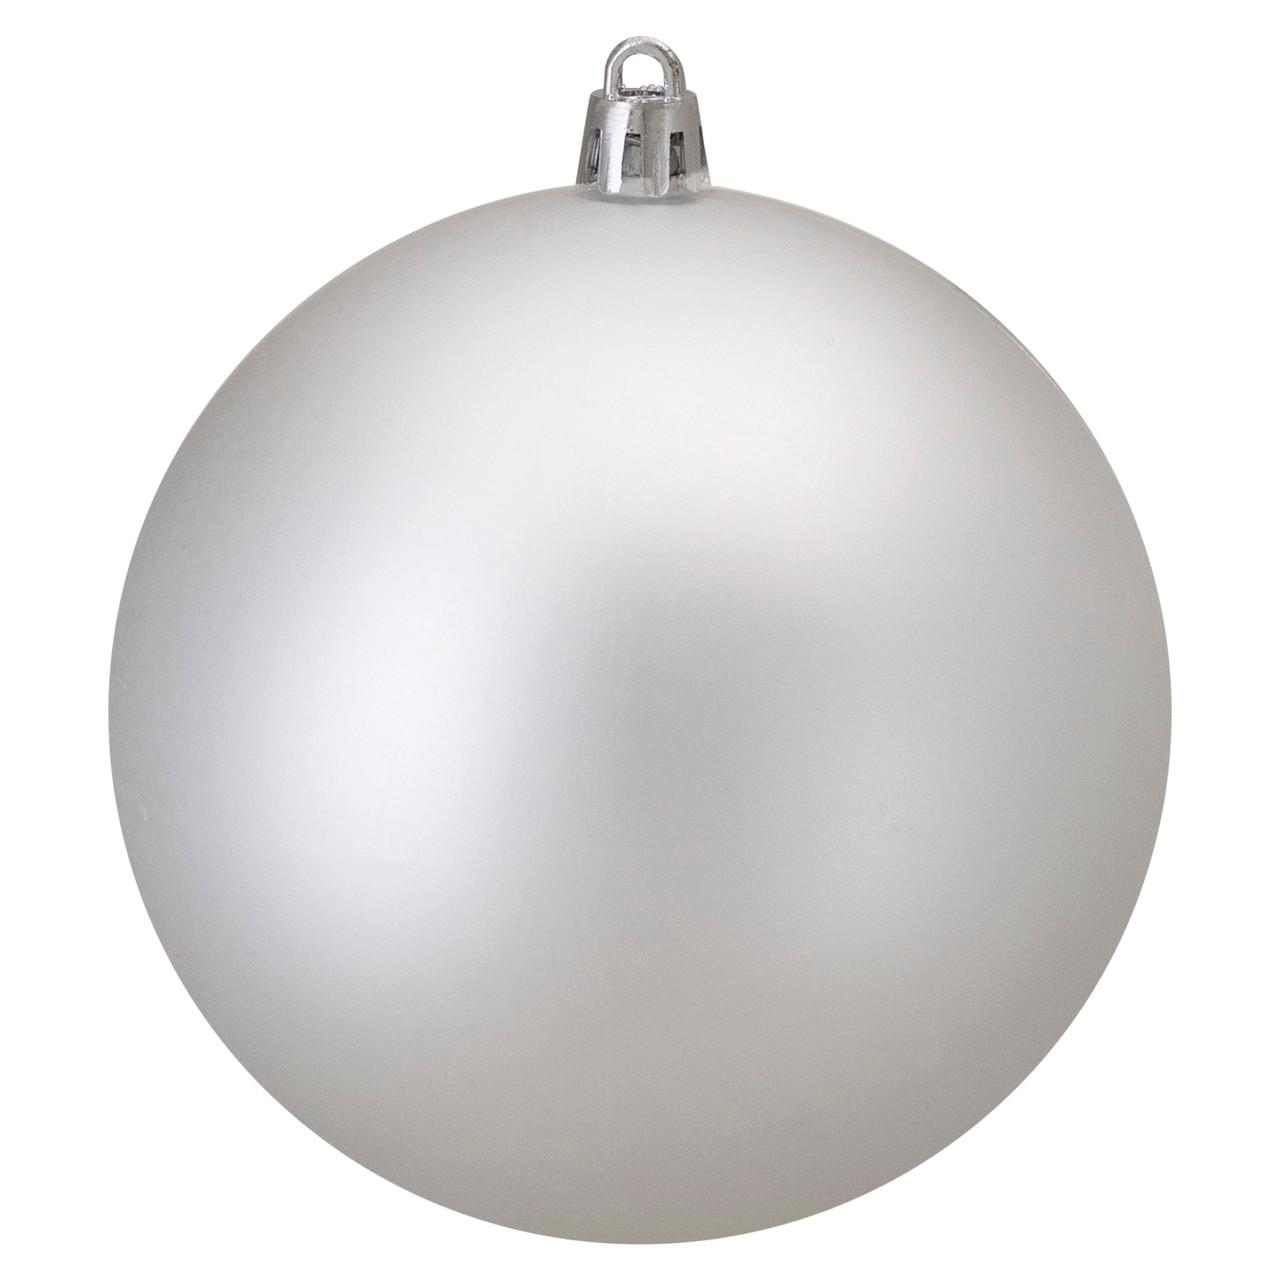 Matte Silver Shatterproof Christmas Ball Ornament 4 100mm Christmas Central